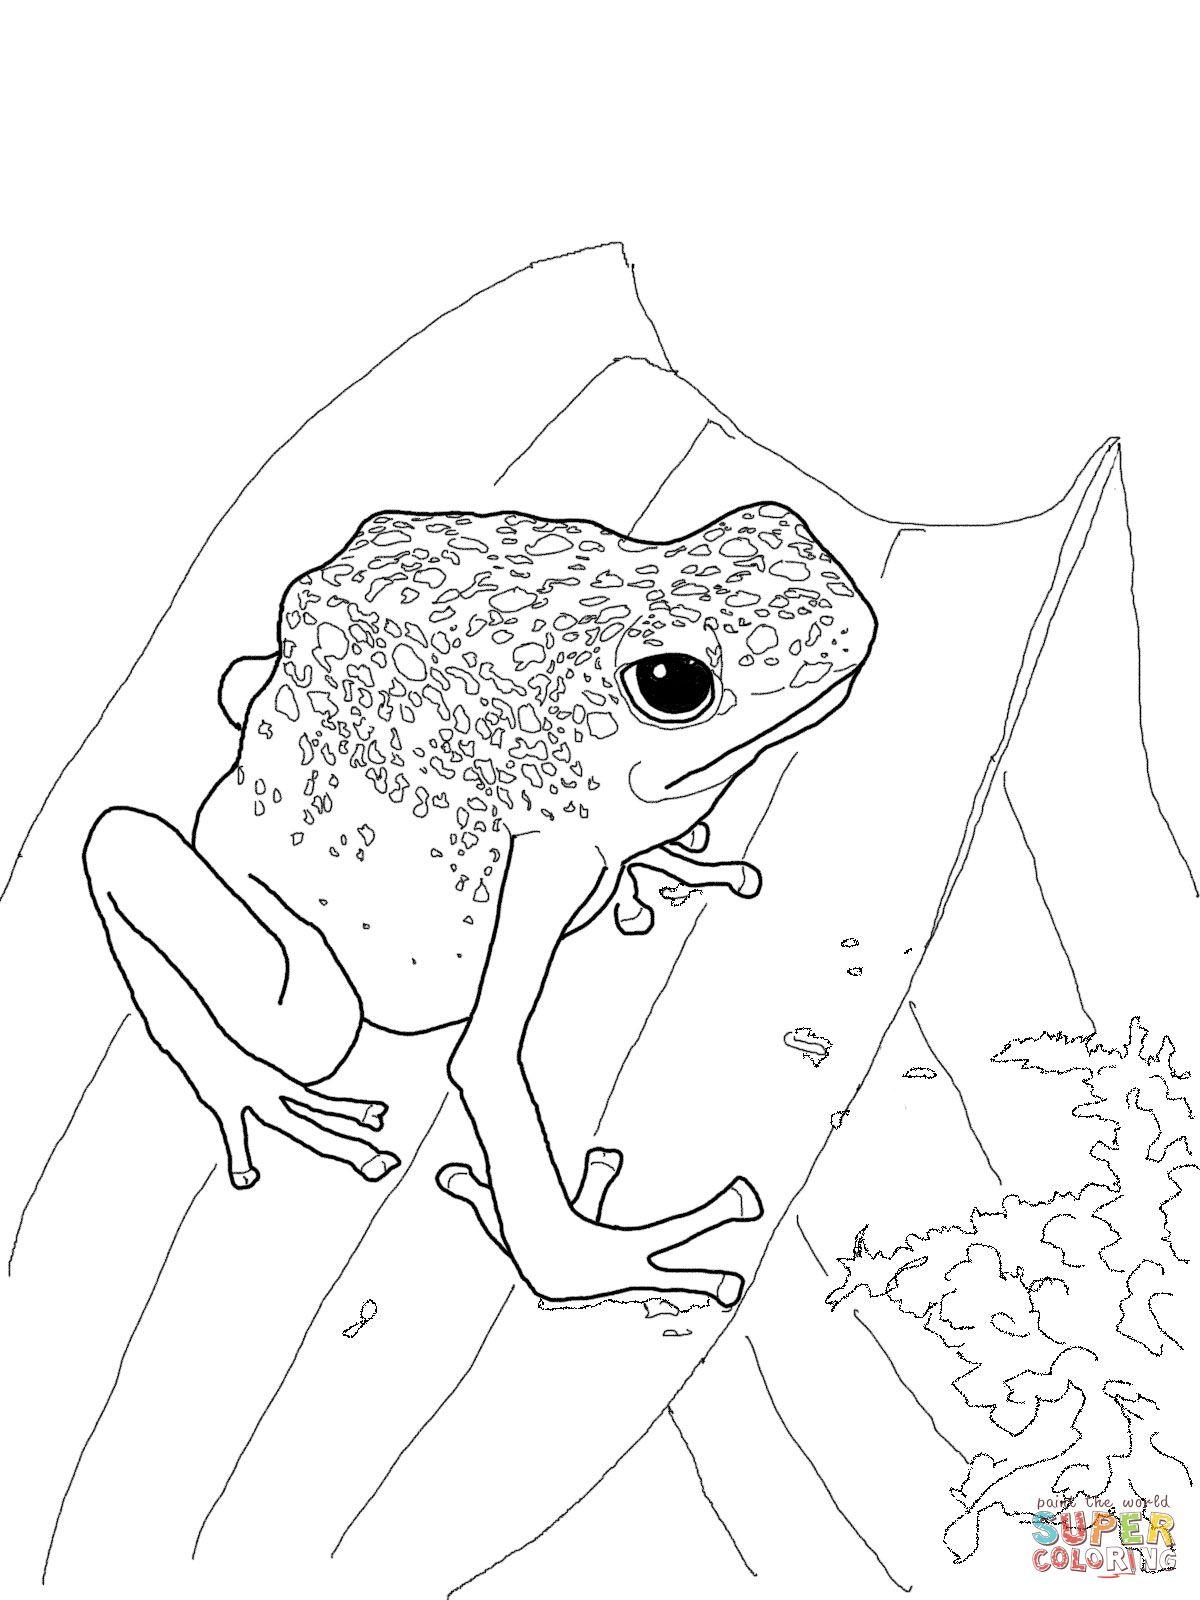 Blue Poison Dart Frog Super Coloring Frog Coloring Pages Blue